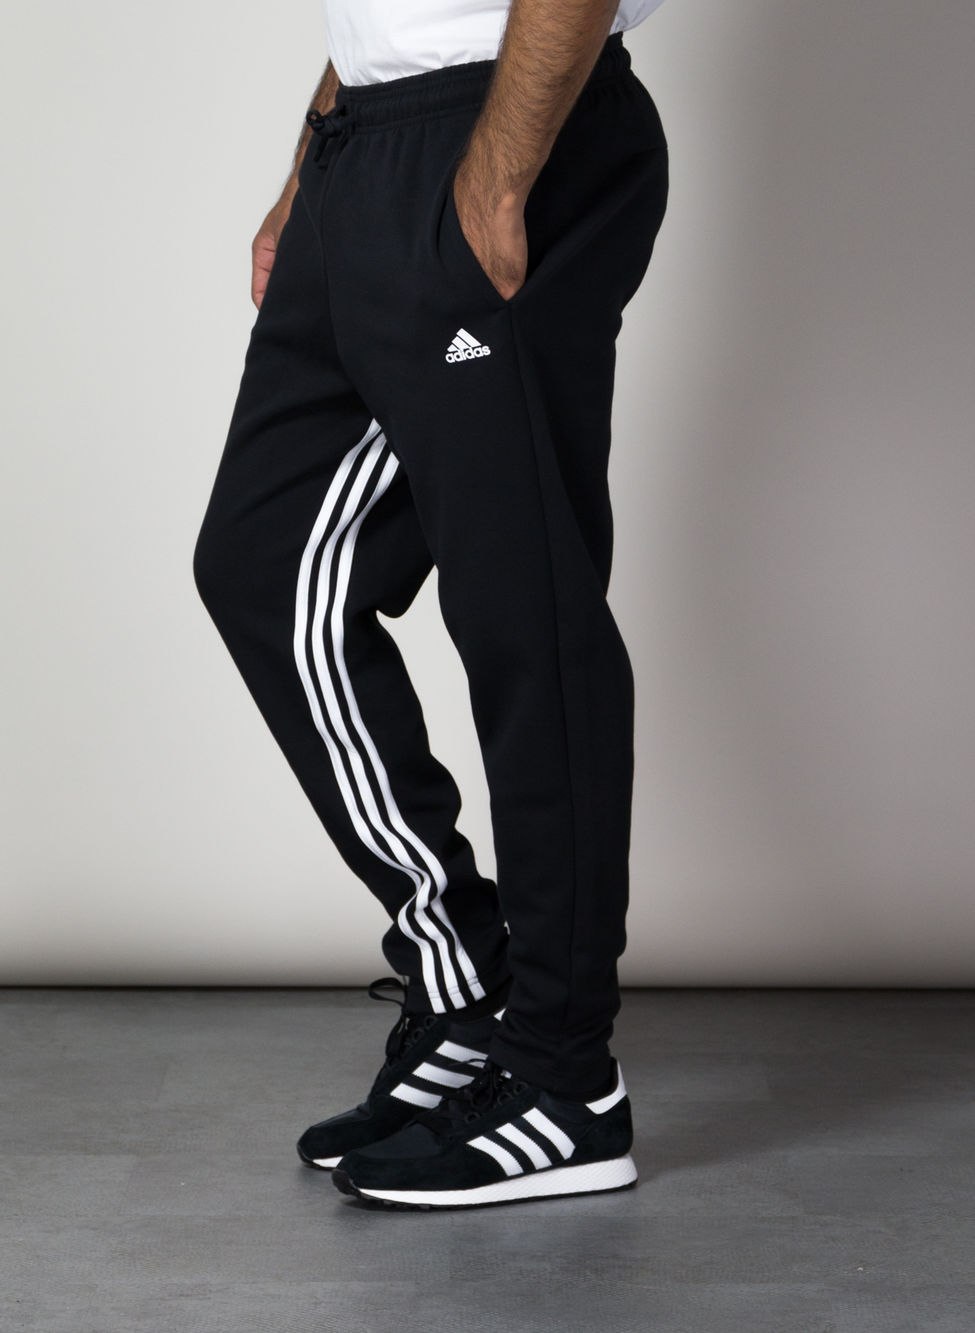 pantaloni adidas tre strisce